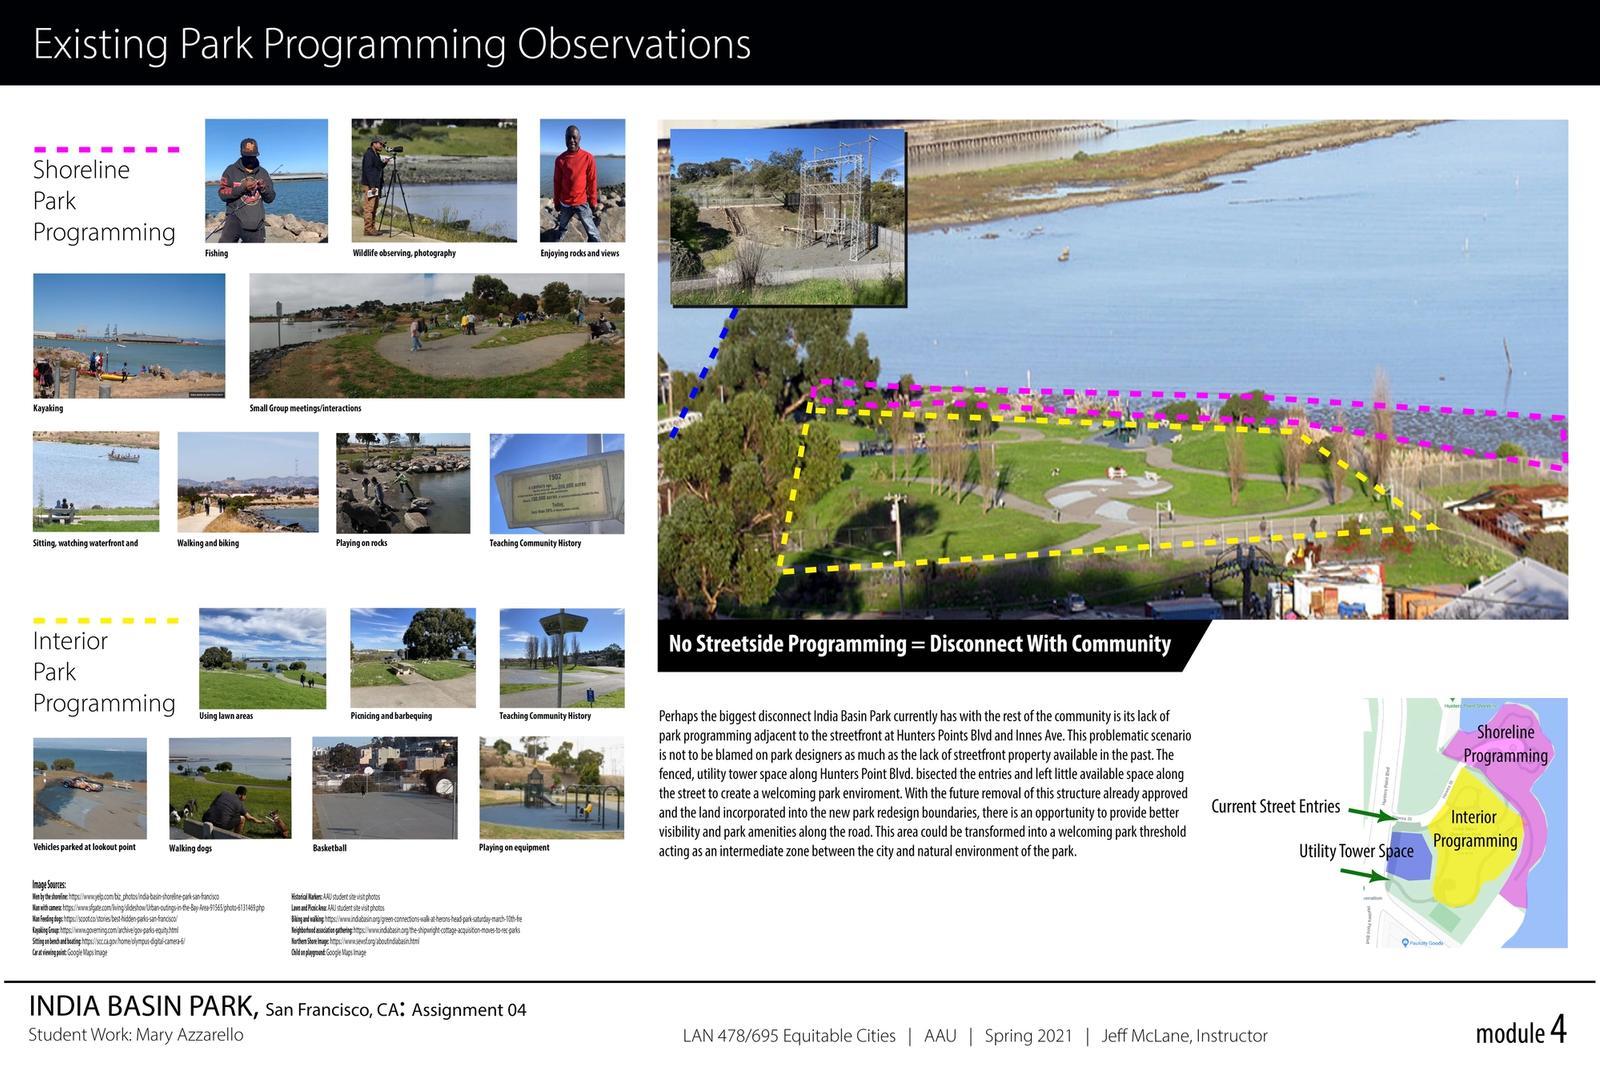 India Basin Park, San Francisco - Existing Park Programming Observations 1